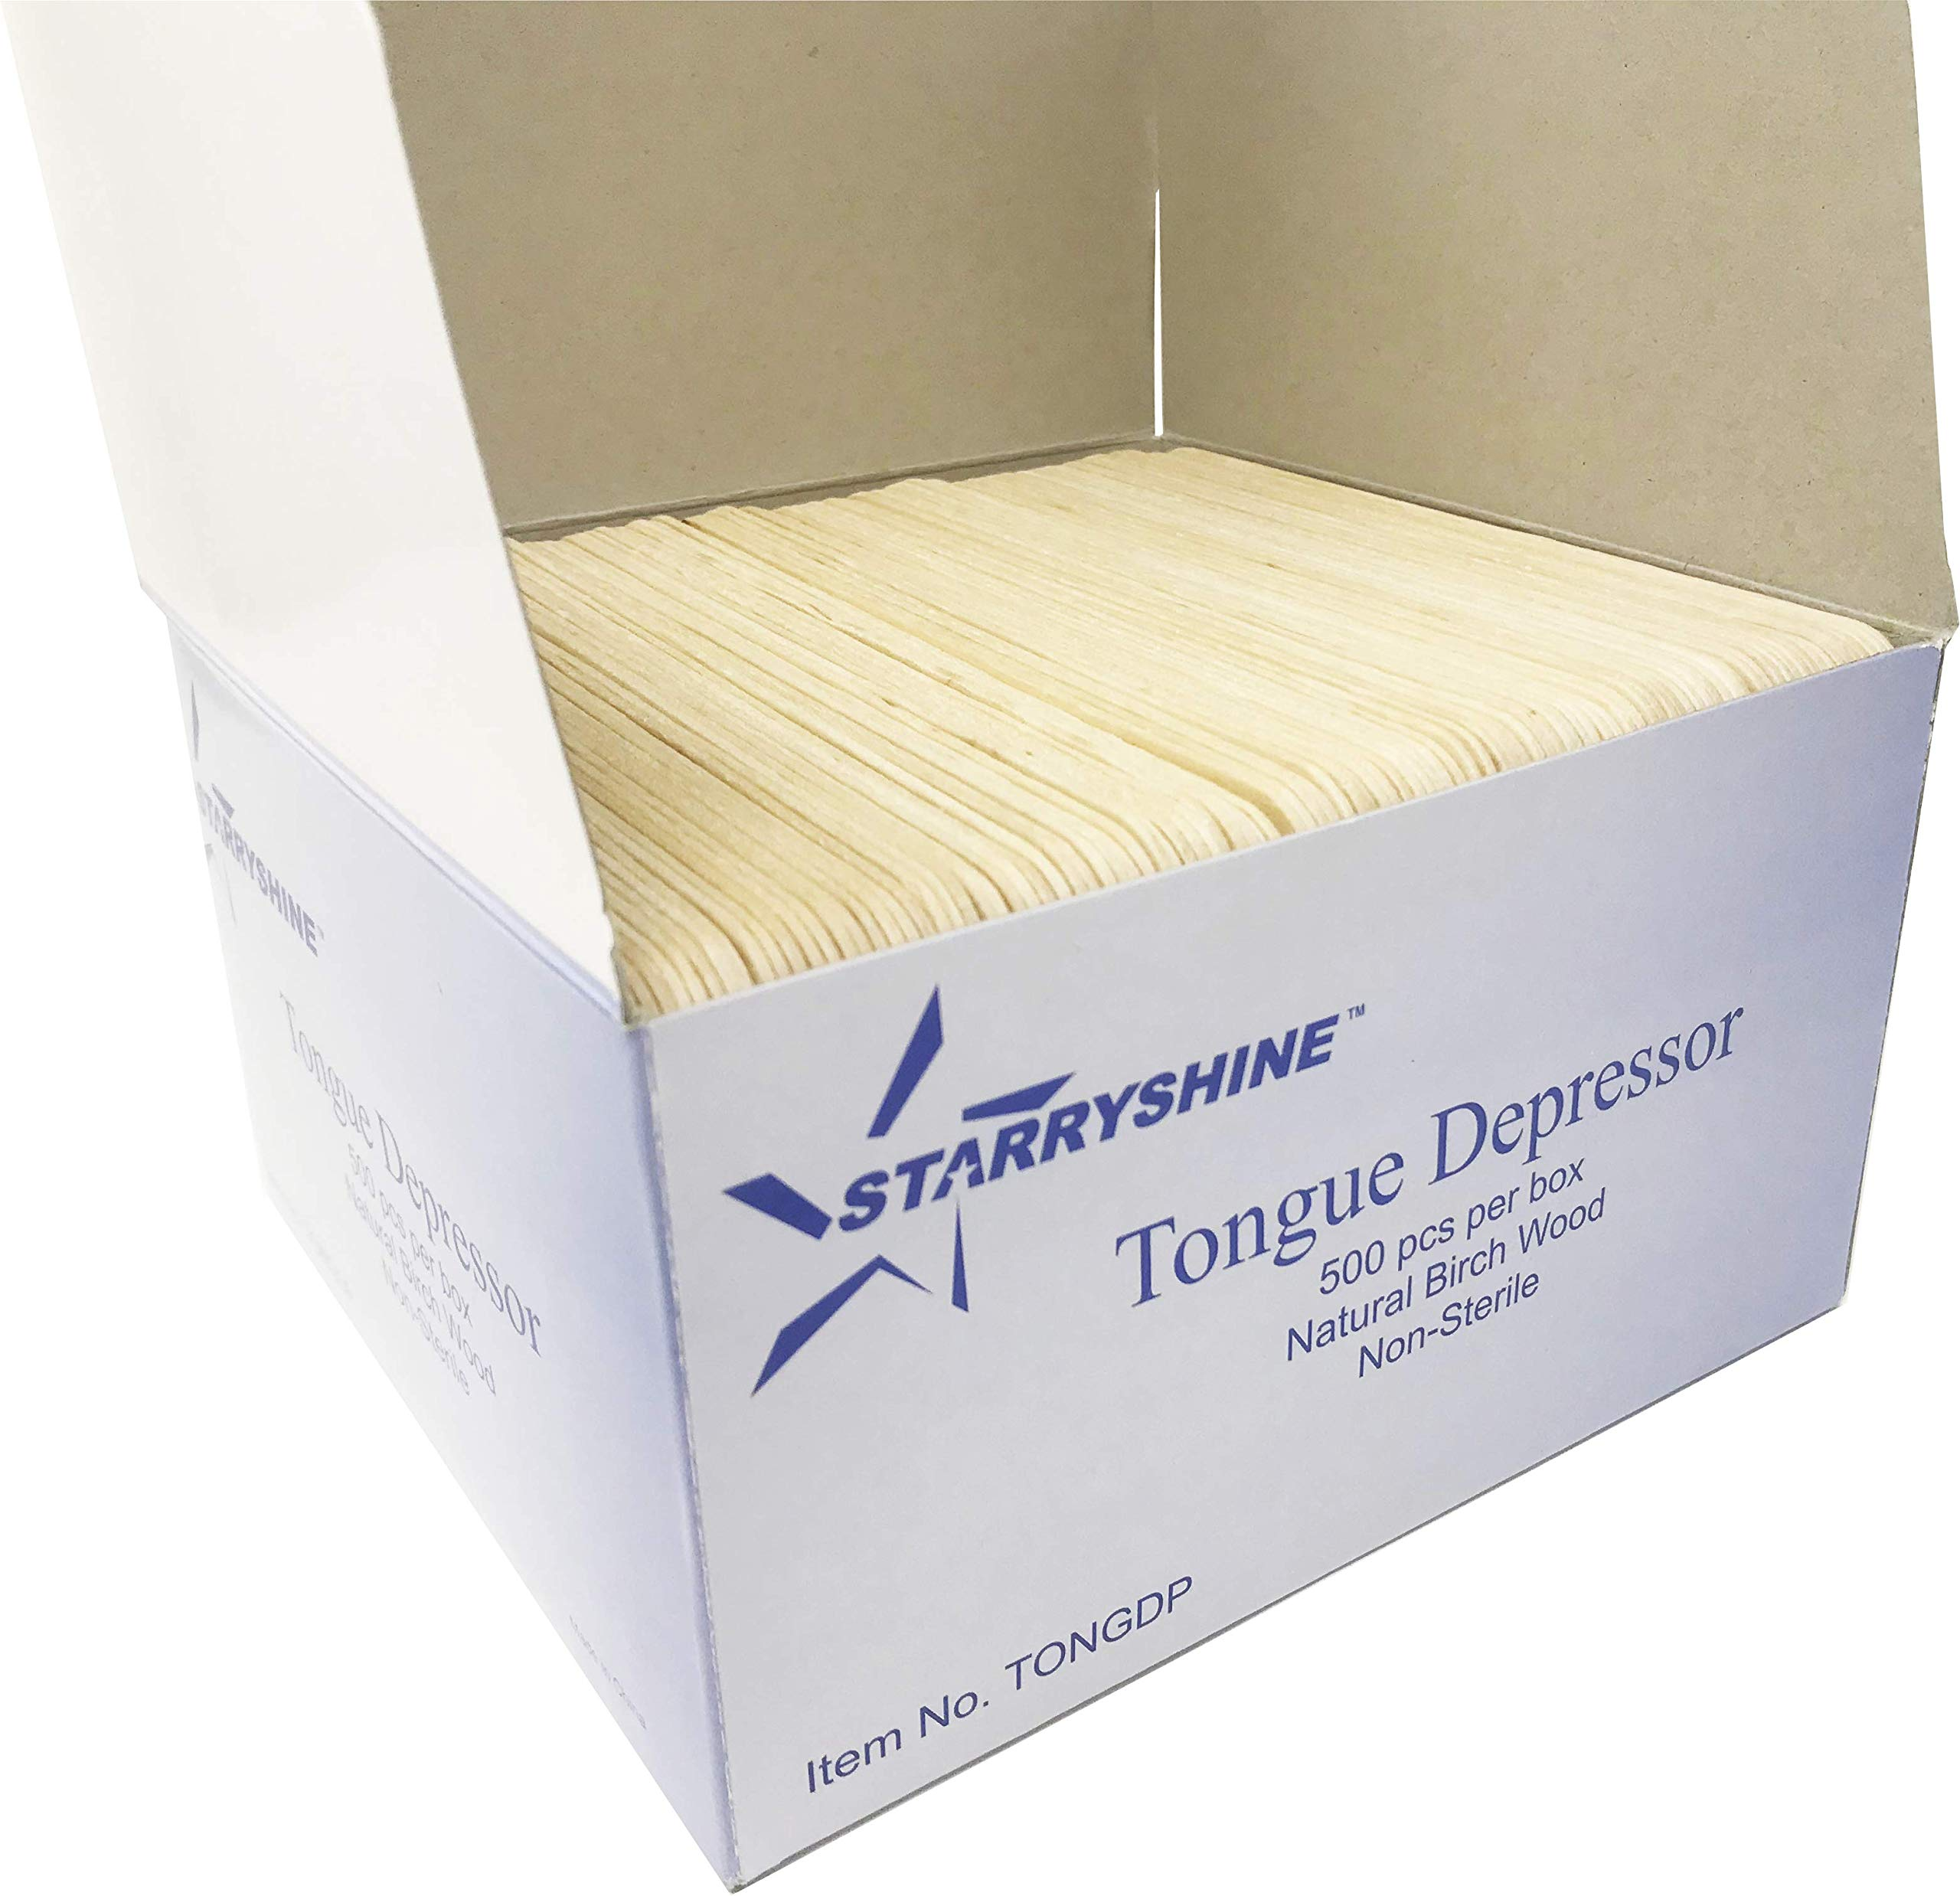 Tongue Depressors Non-STERILE Standard Size 6''x0.75'', Premium Natural Birch Wood Craft Sticks (2500 PCS (5 BX)) by Starryshine (Image #4)